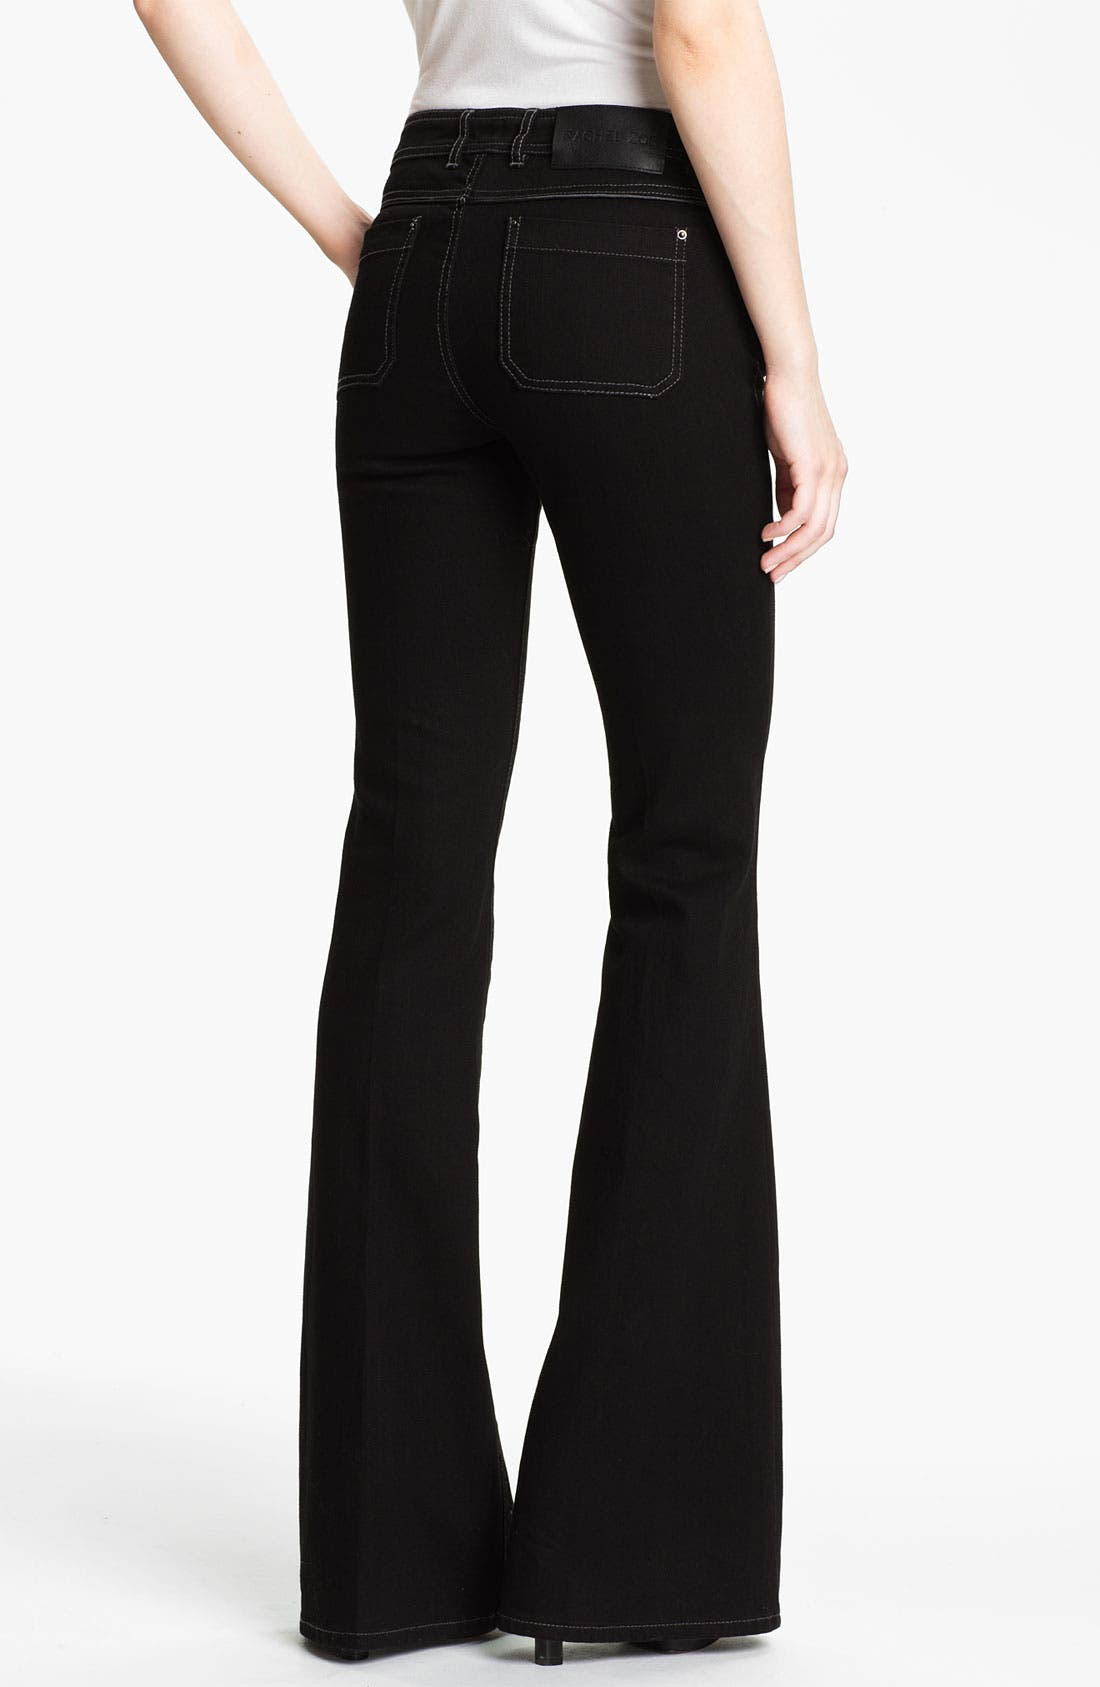 Alternate Image 2  - Rachel Zoe 'Rachel' Flare Leg Jeans (Long)